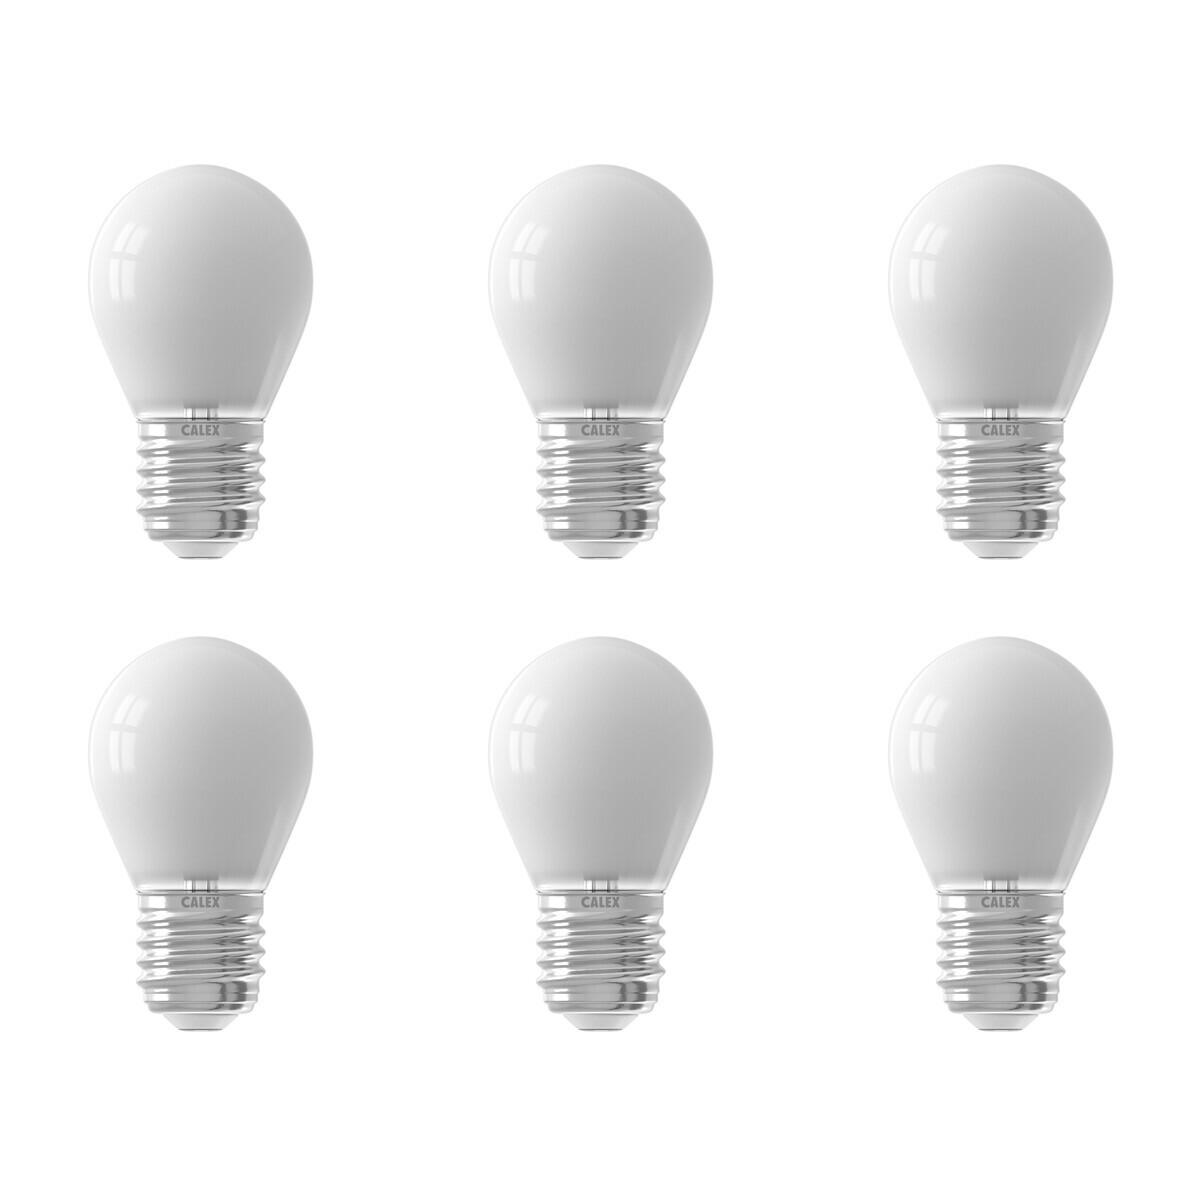 CALEX - LED Lamp 6 Pack - Kogellamp P45 Softline - E27 Fitting - Dimbaar - 3.5W - Warm Wit 2700K